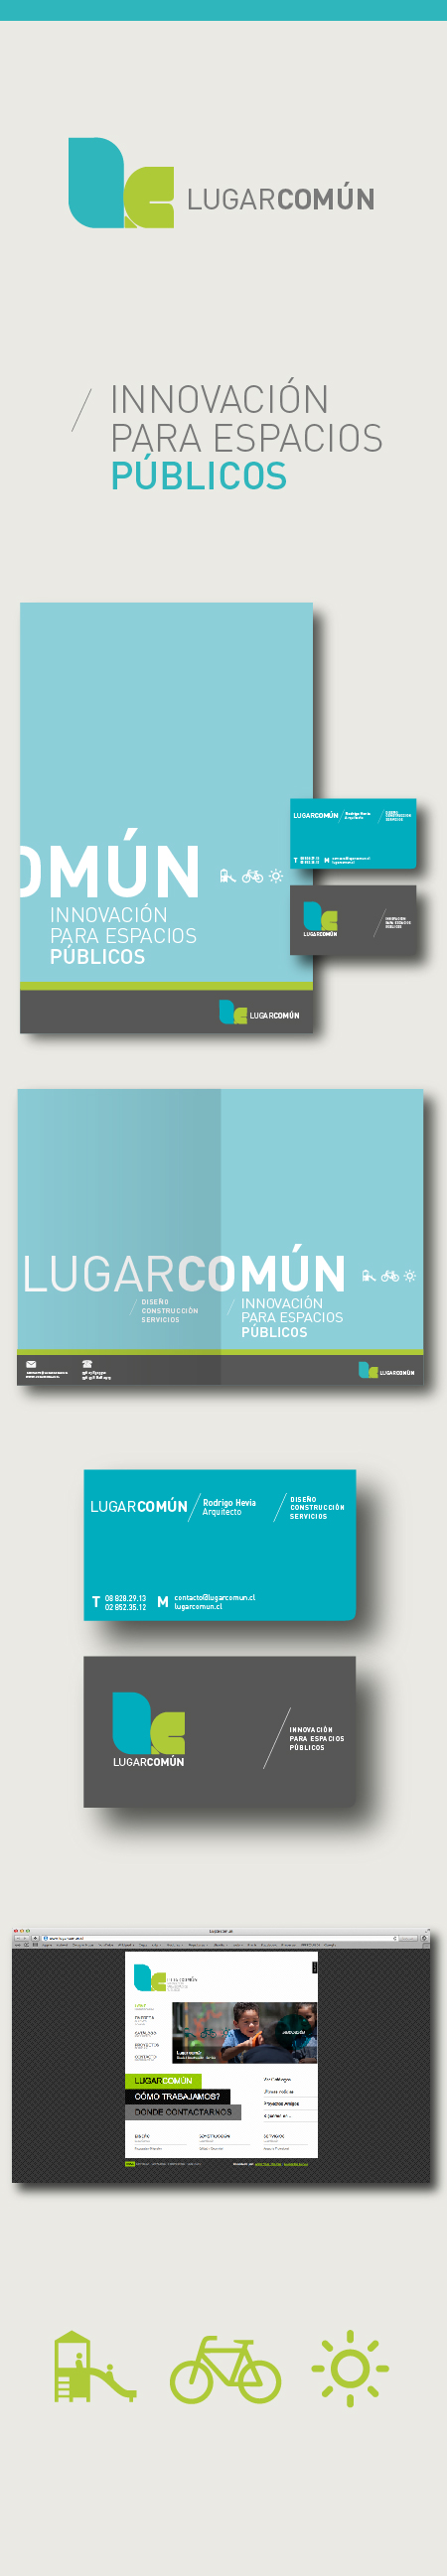 lc_logo-01